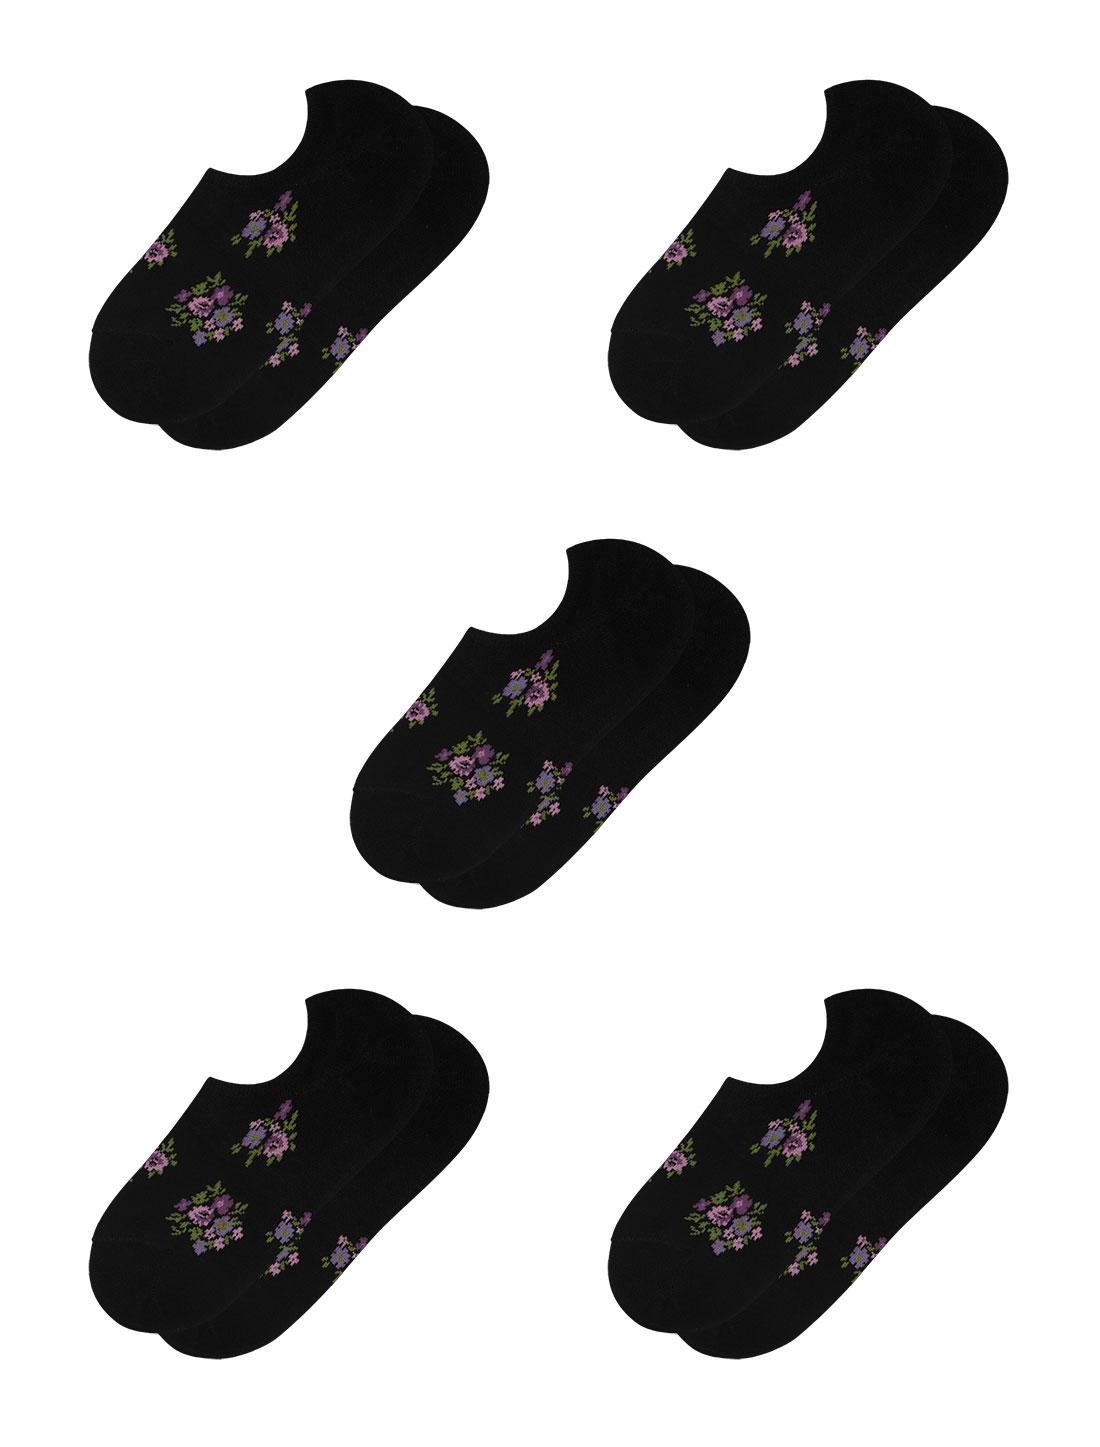 Women Floral Print Low Cut Elastic Cuffs Short Socks 5 Pairs Black 7-9